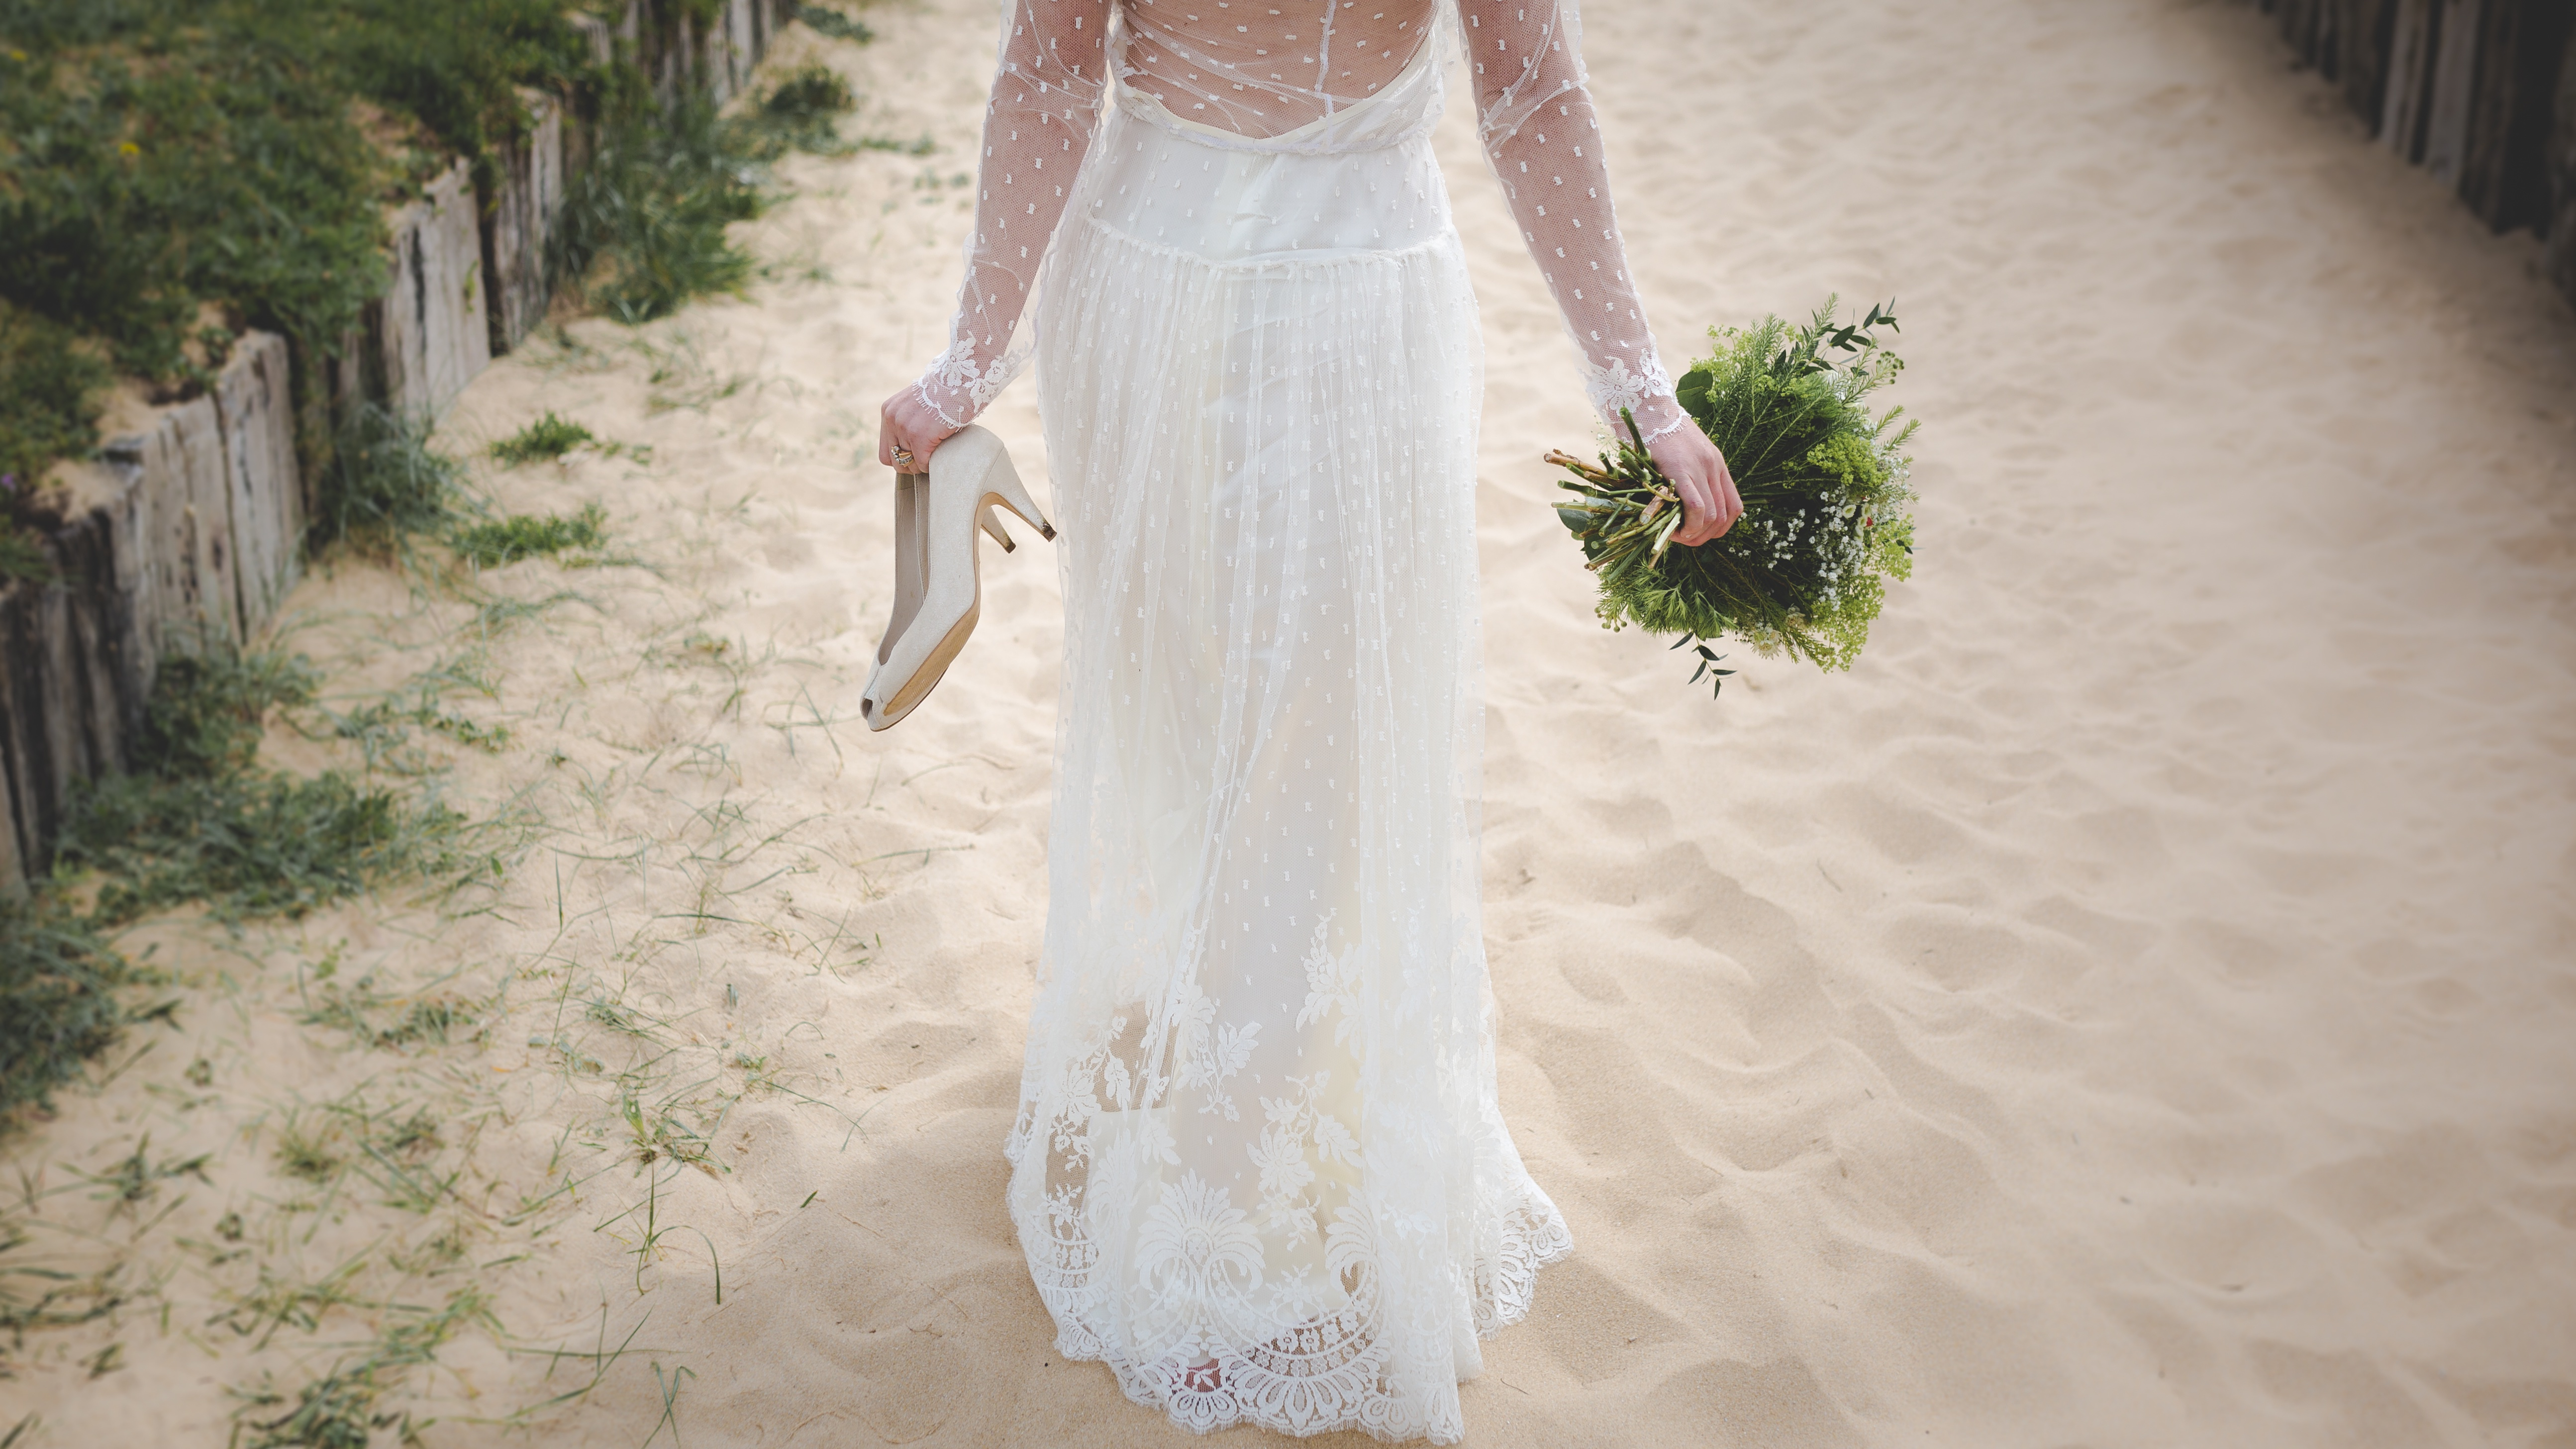 Dress DonationsGift a Dress   Brides Across America. Donating Wedding Dresses. Home Design Ideas